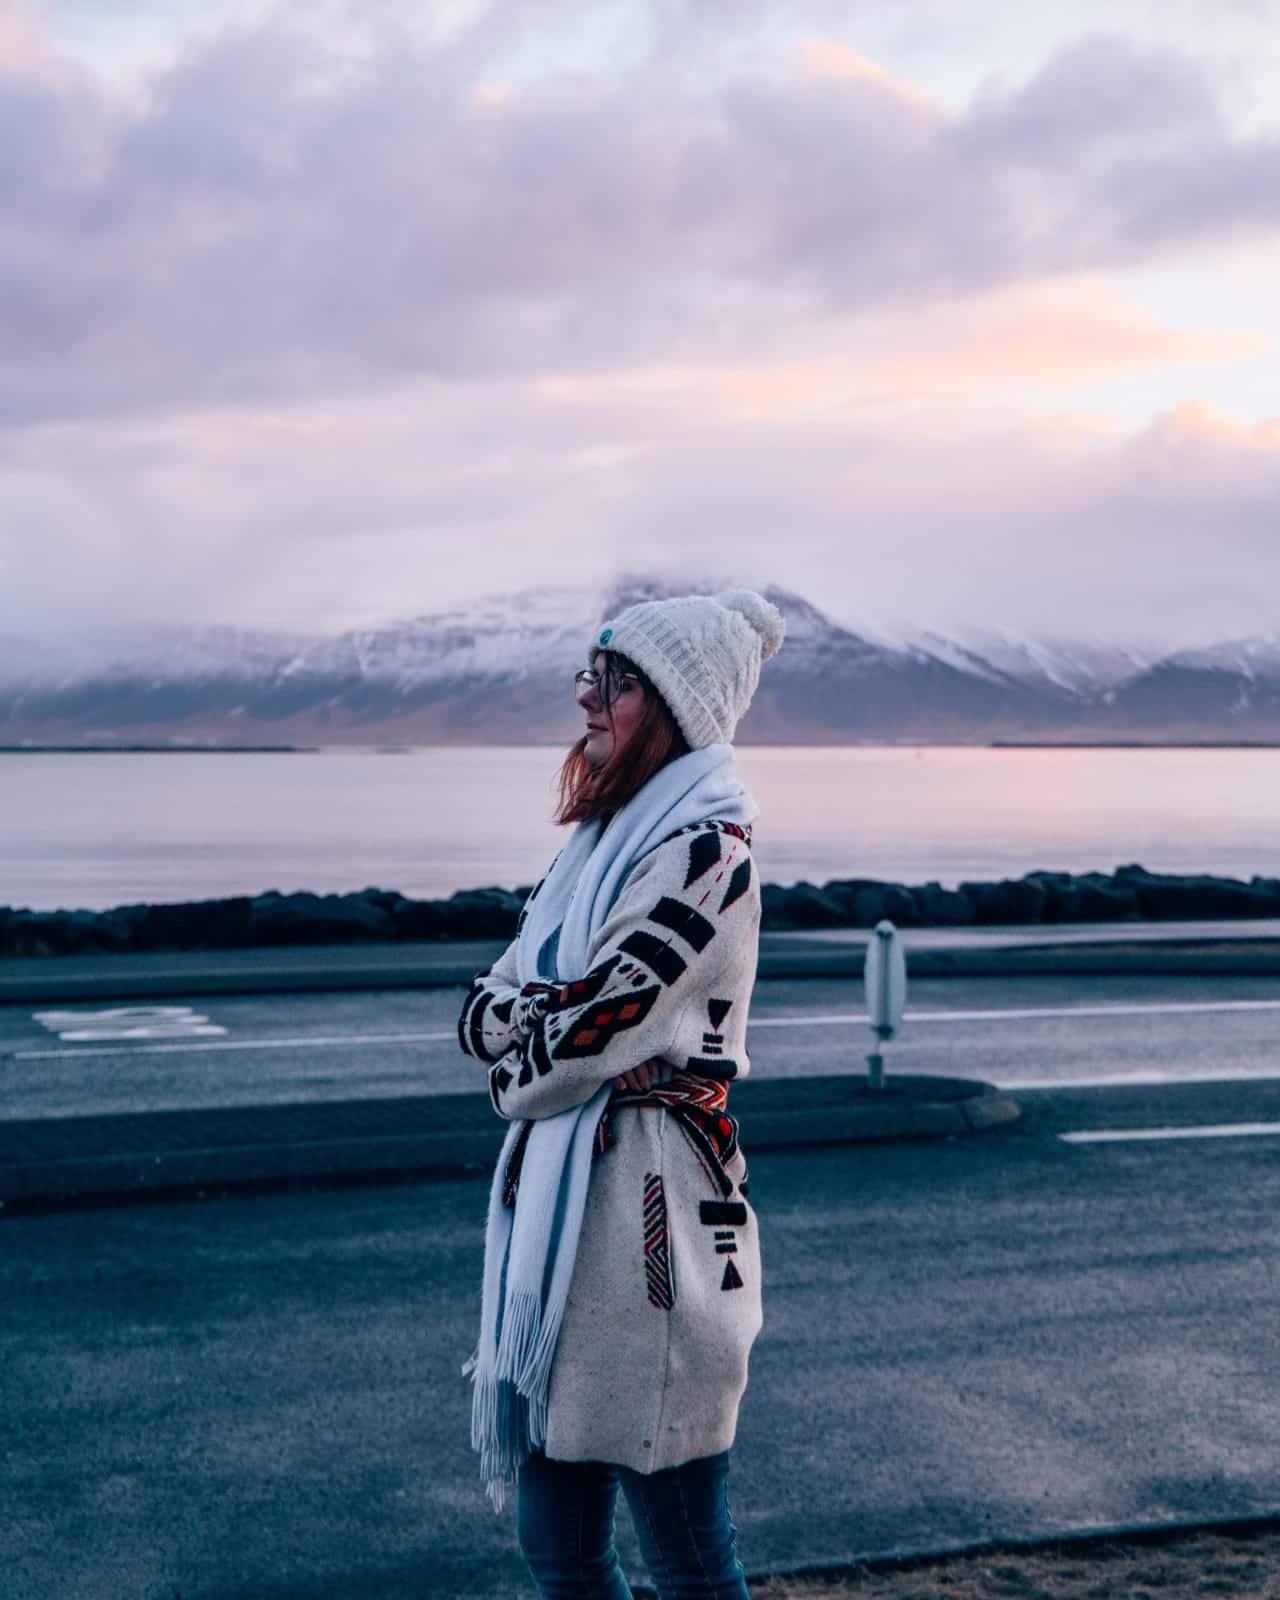 Island Instagram Diary - 3 Tage Roadtrip ab Reykjavik: Gullfoss - Þingvellir - Seljalandsfoss - Seljavallalaug - Reynisfjara